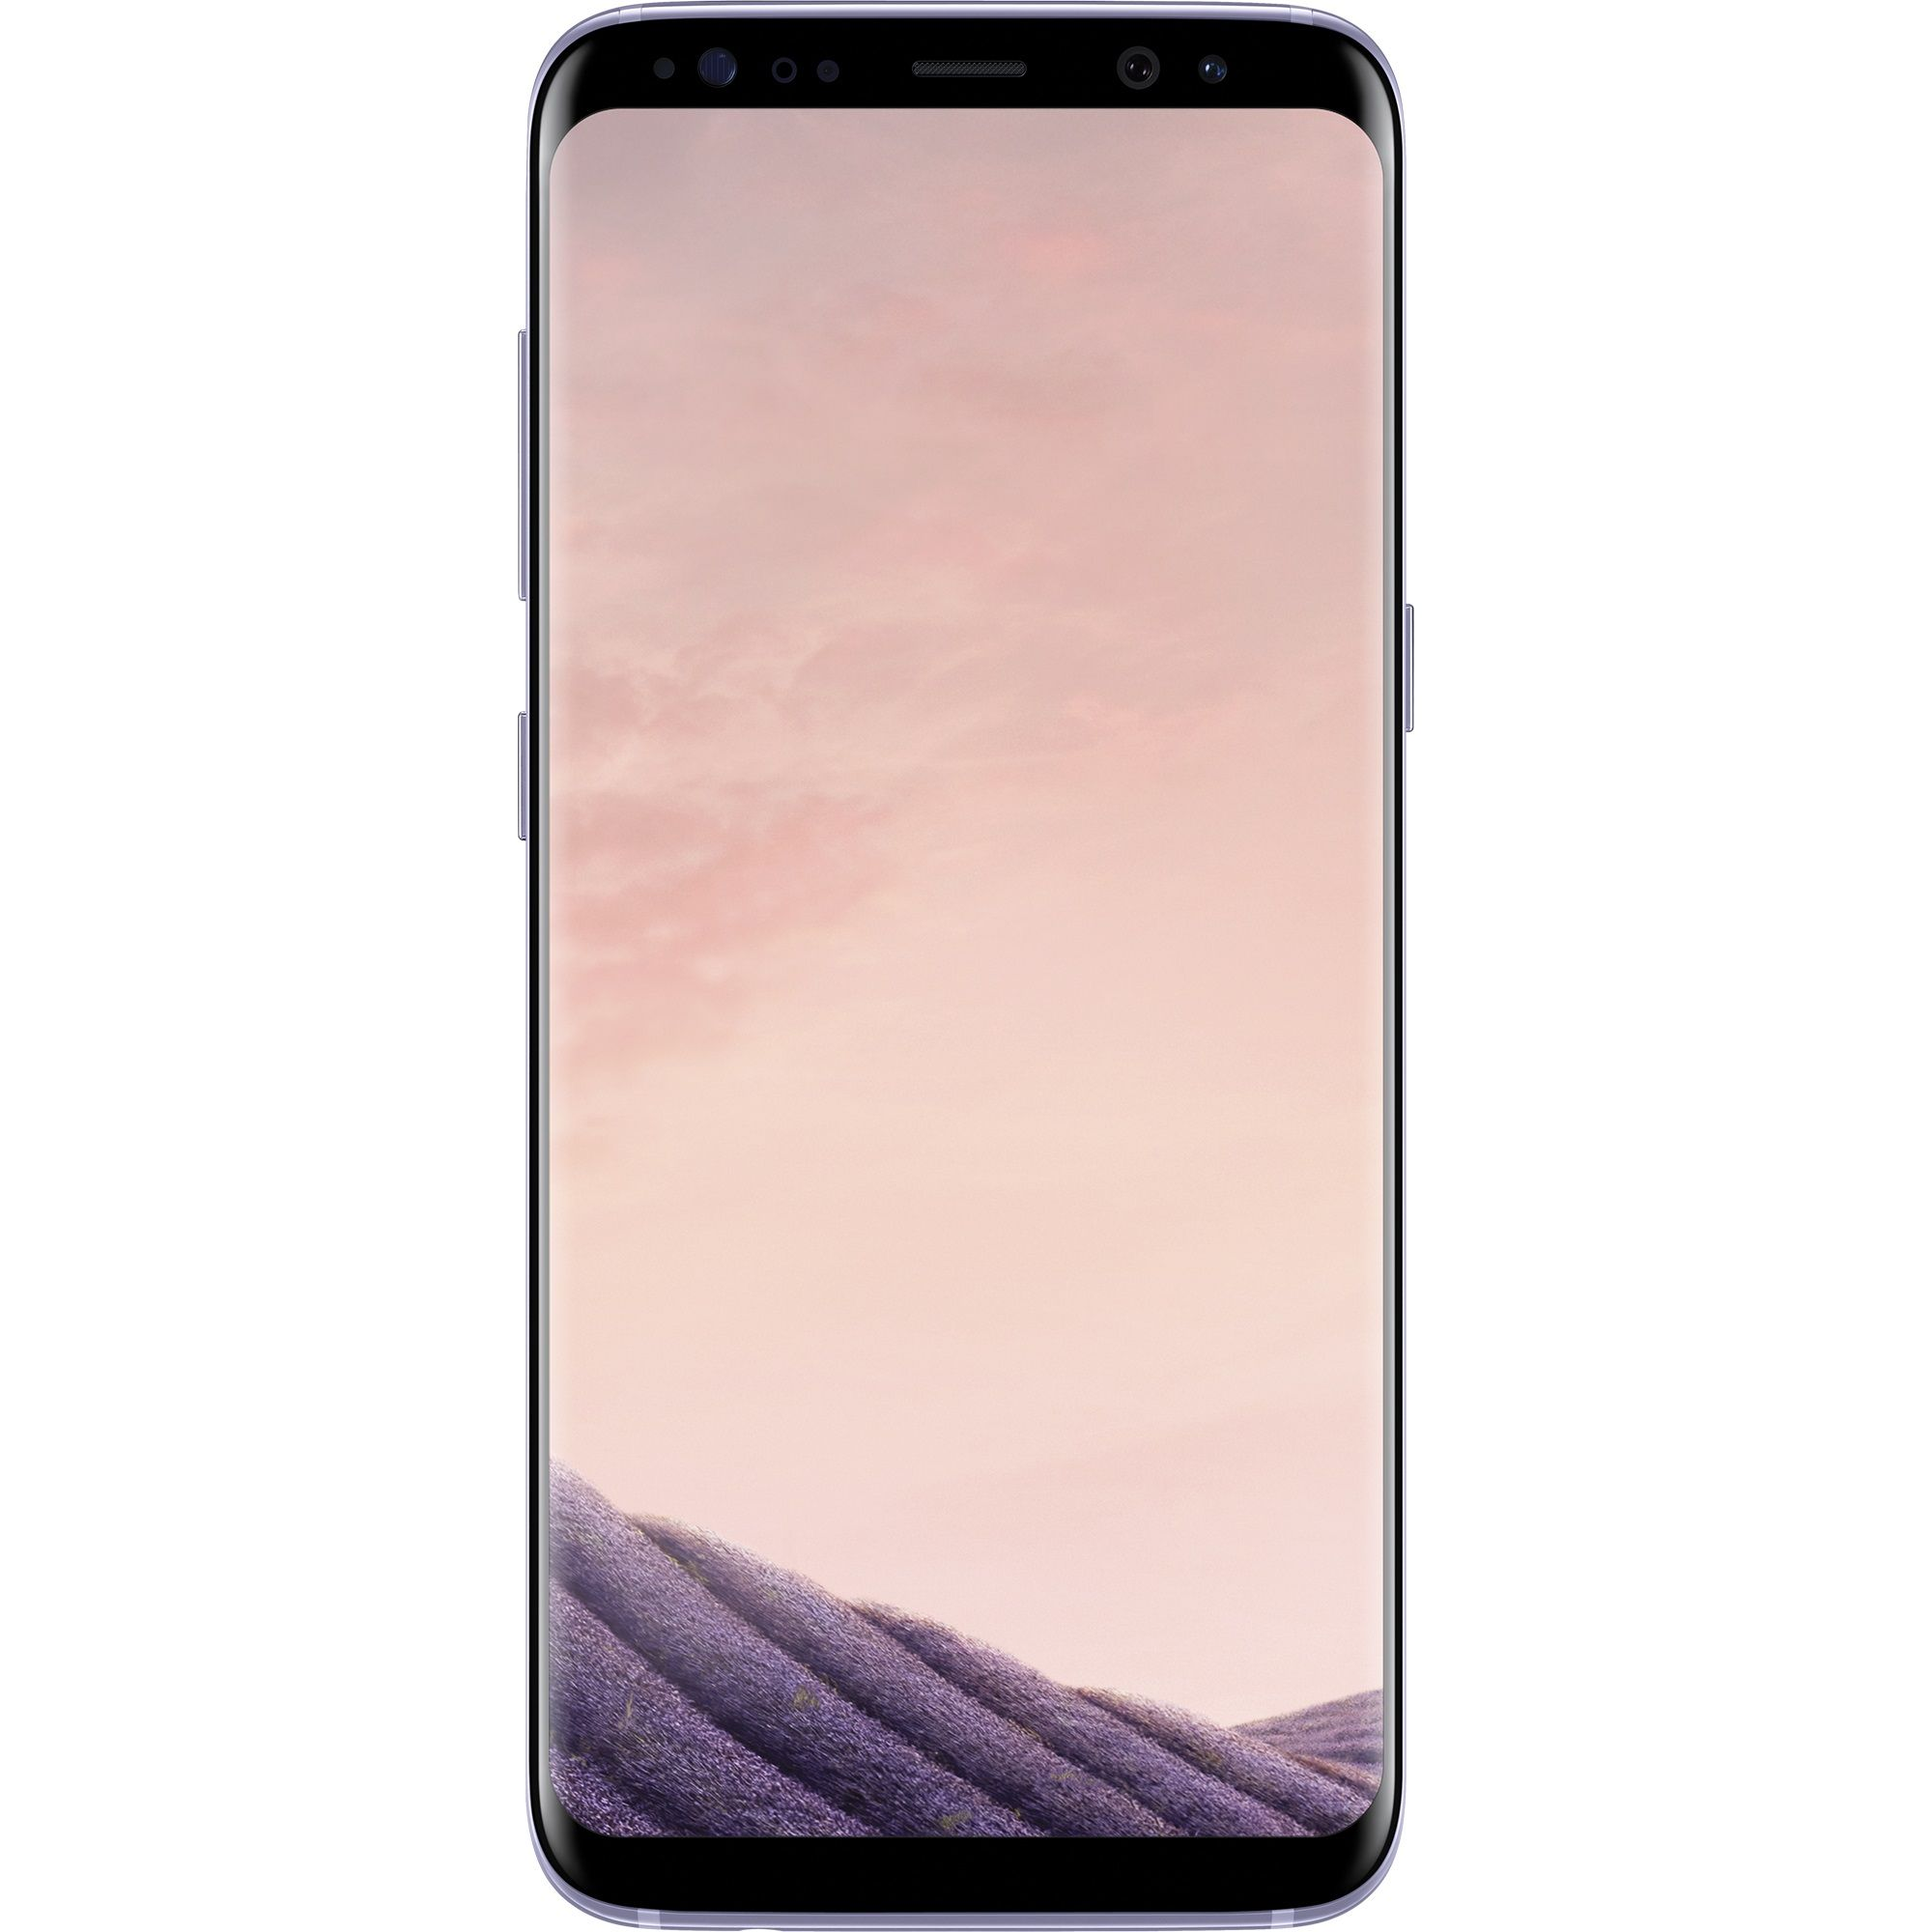 Telefon Mobil Samsung Galaxy S8 G950 64GB Flash 4GB RAM Single SIM 4G Orchid Grey